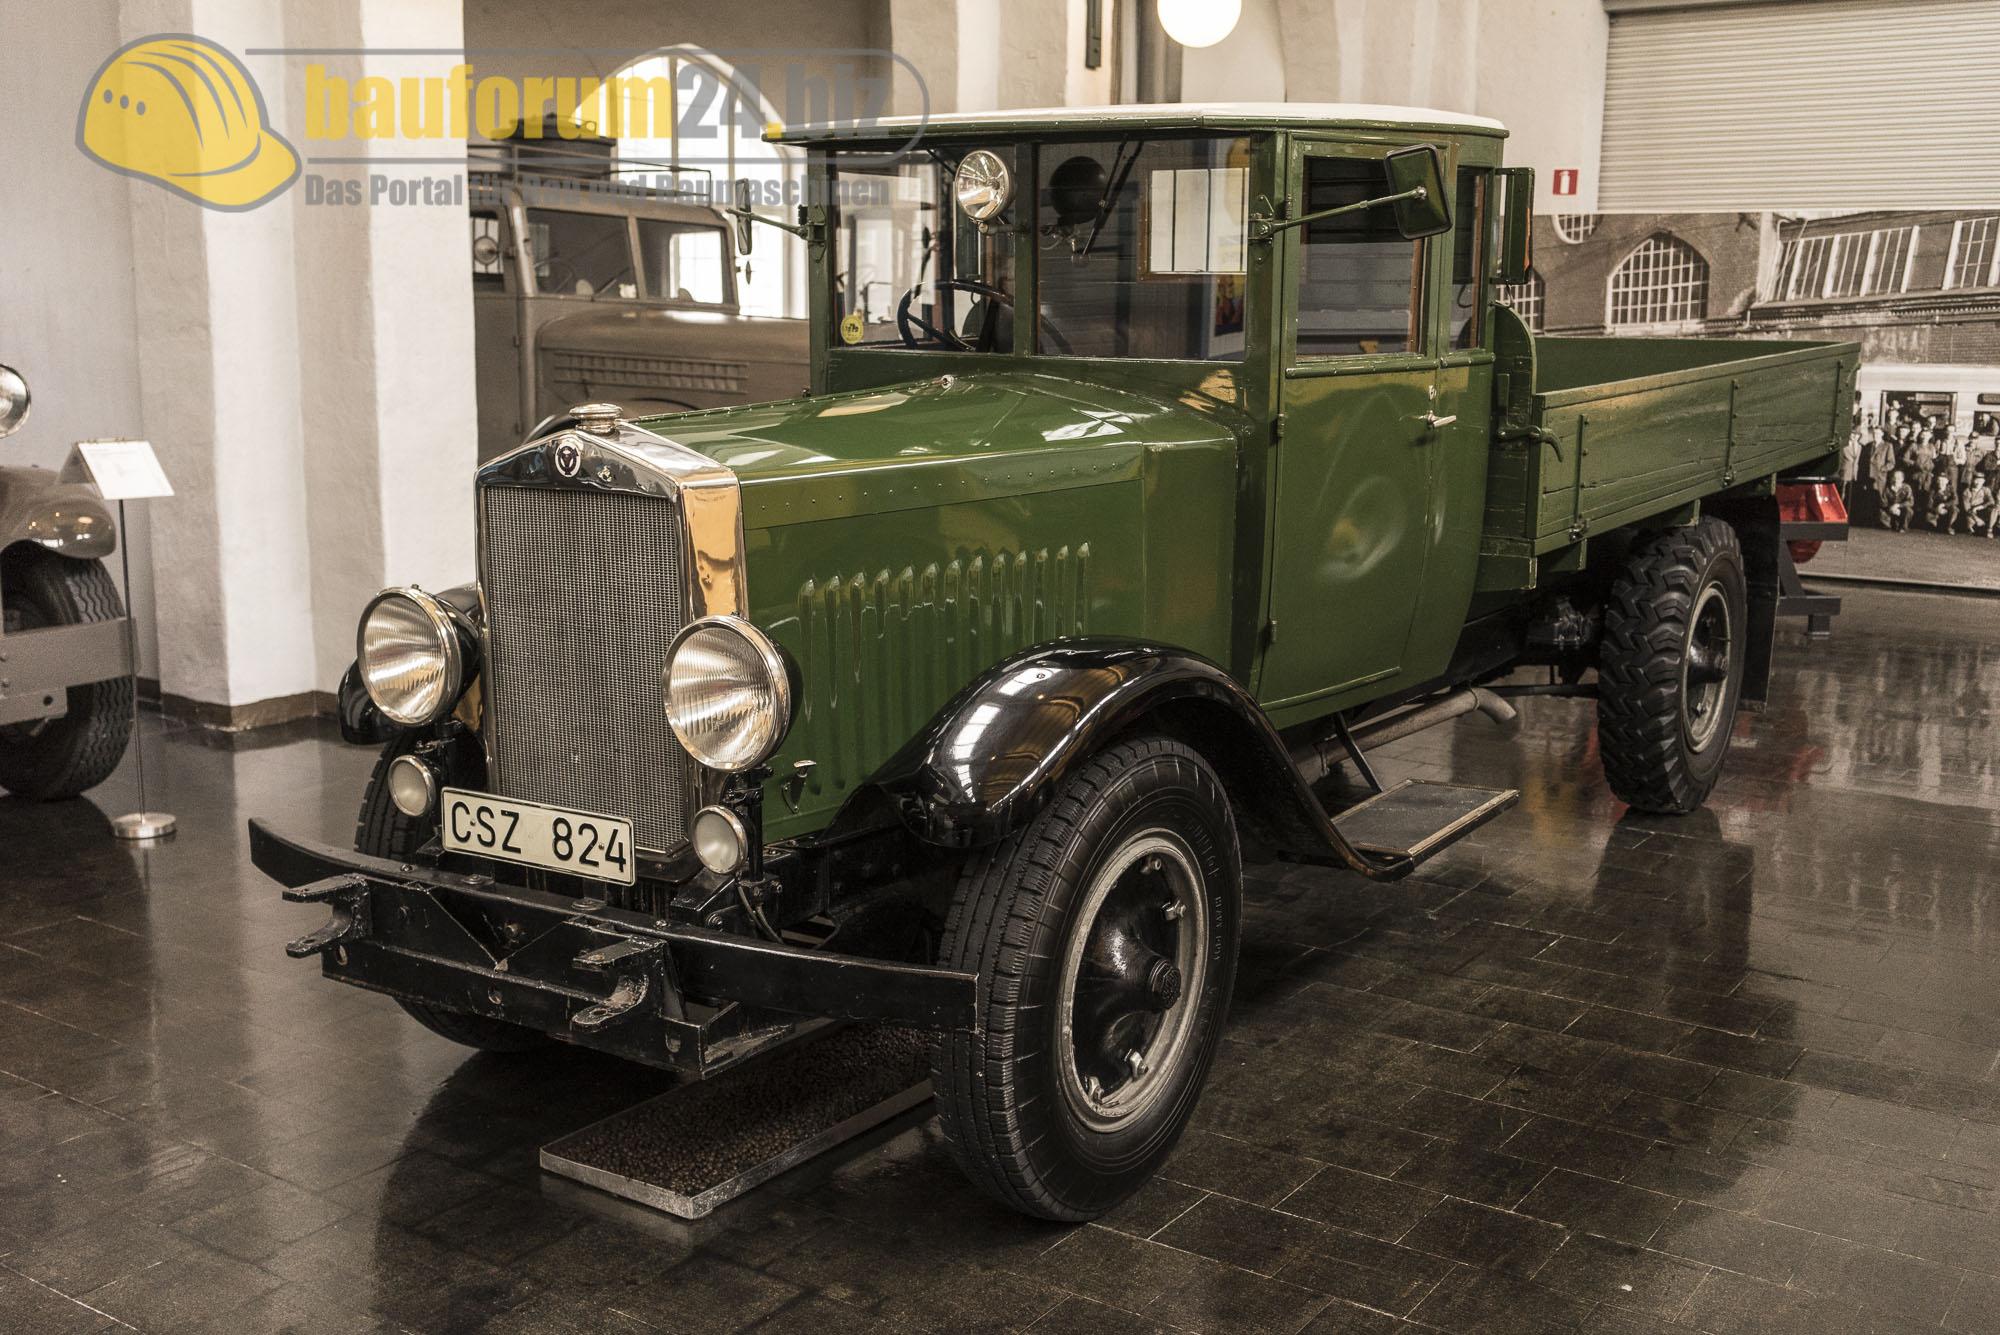 Fotostrecke: Scania Oldtimer Museum in Södertälje / Schweden ...